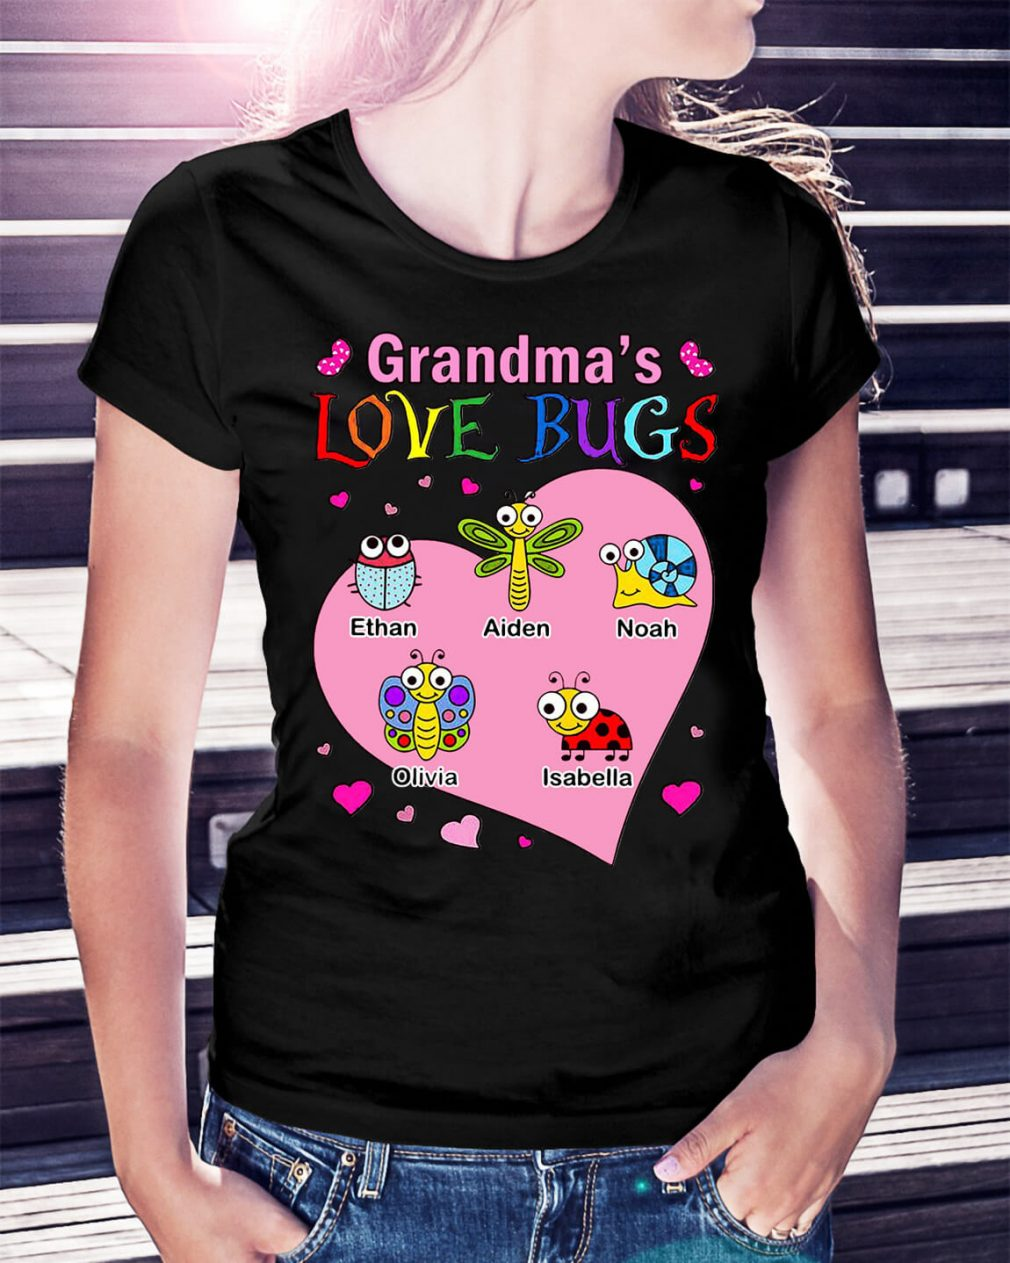 Grandma's love bugs Ethan Aiden Noah Olivia Isabella shirt